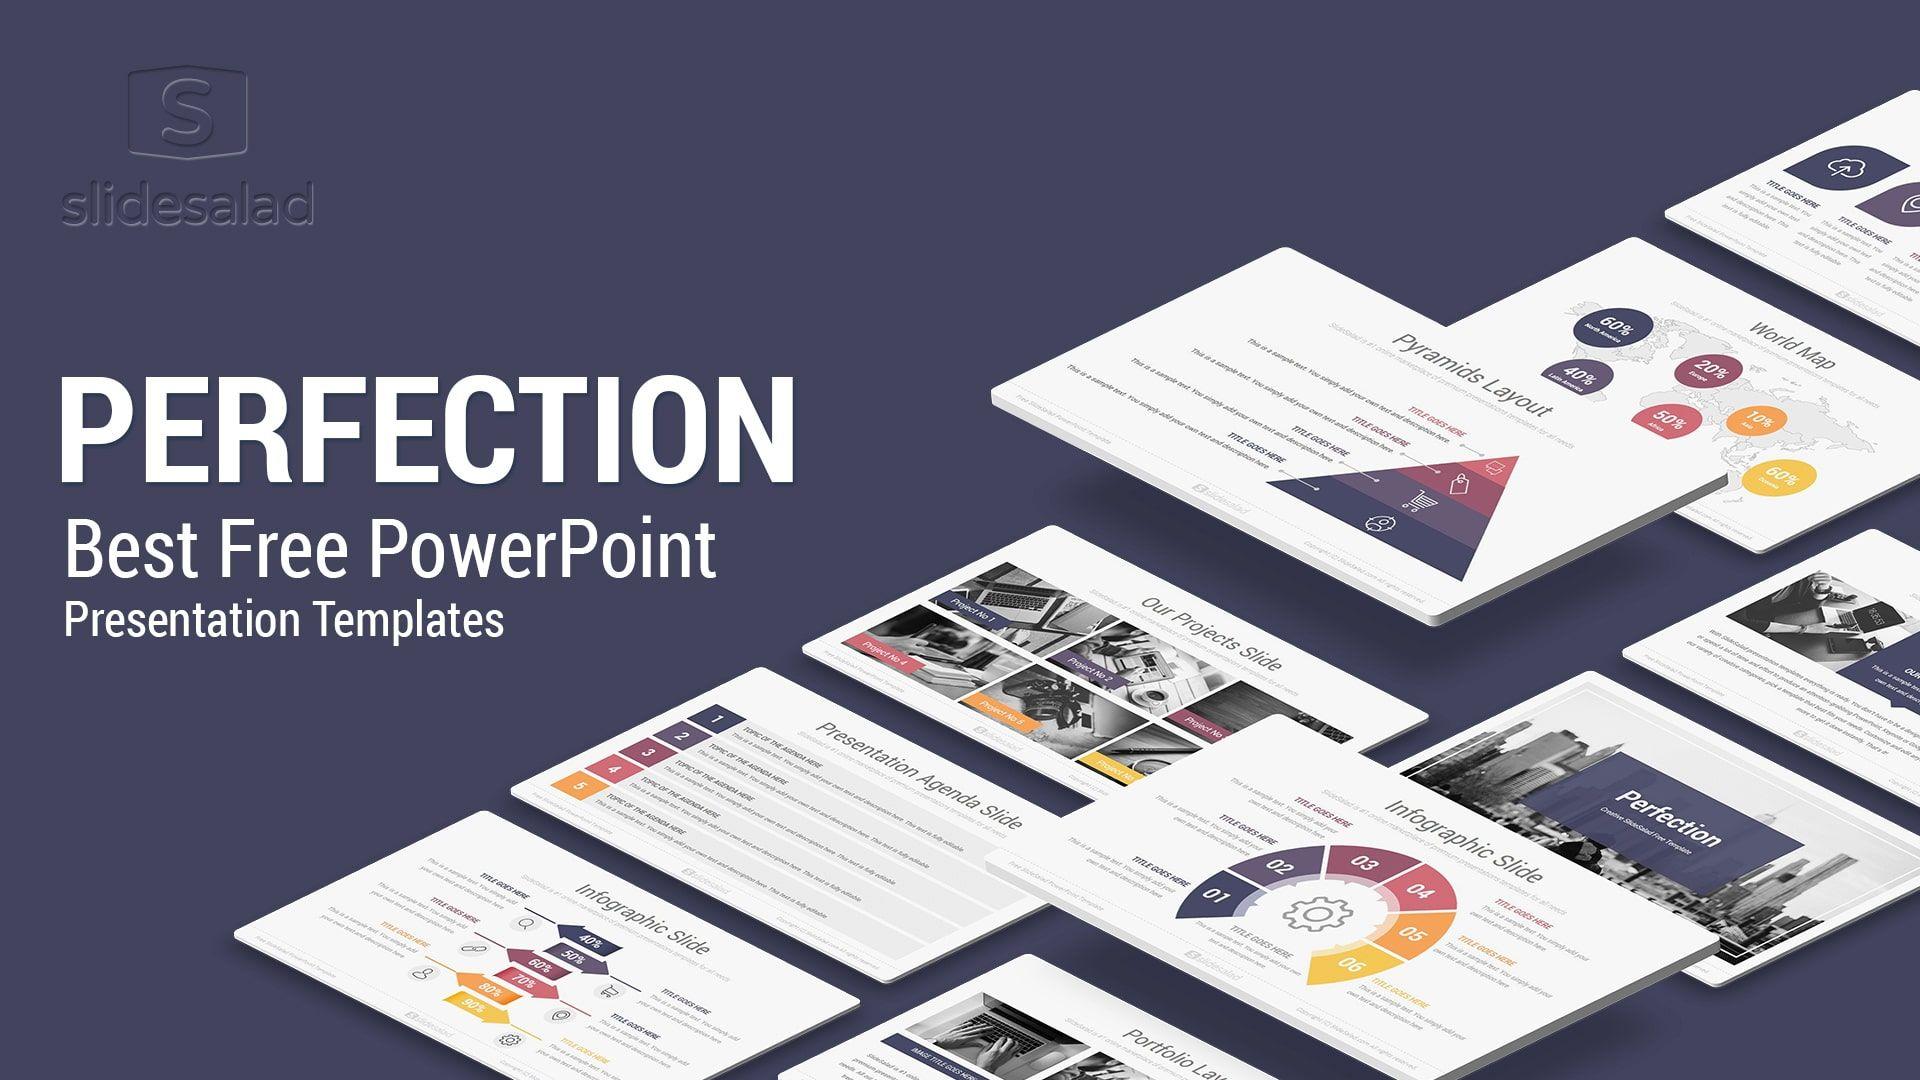 Perfection Free Powerpoint Presentation Template Free Download Powerpoint Template Free Powerpoint Presentation Free Powerpoint Presentations